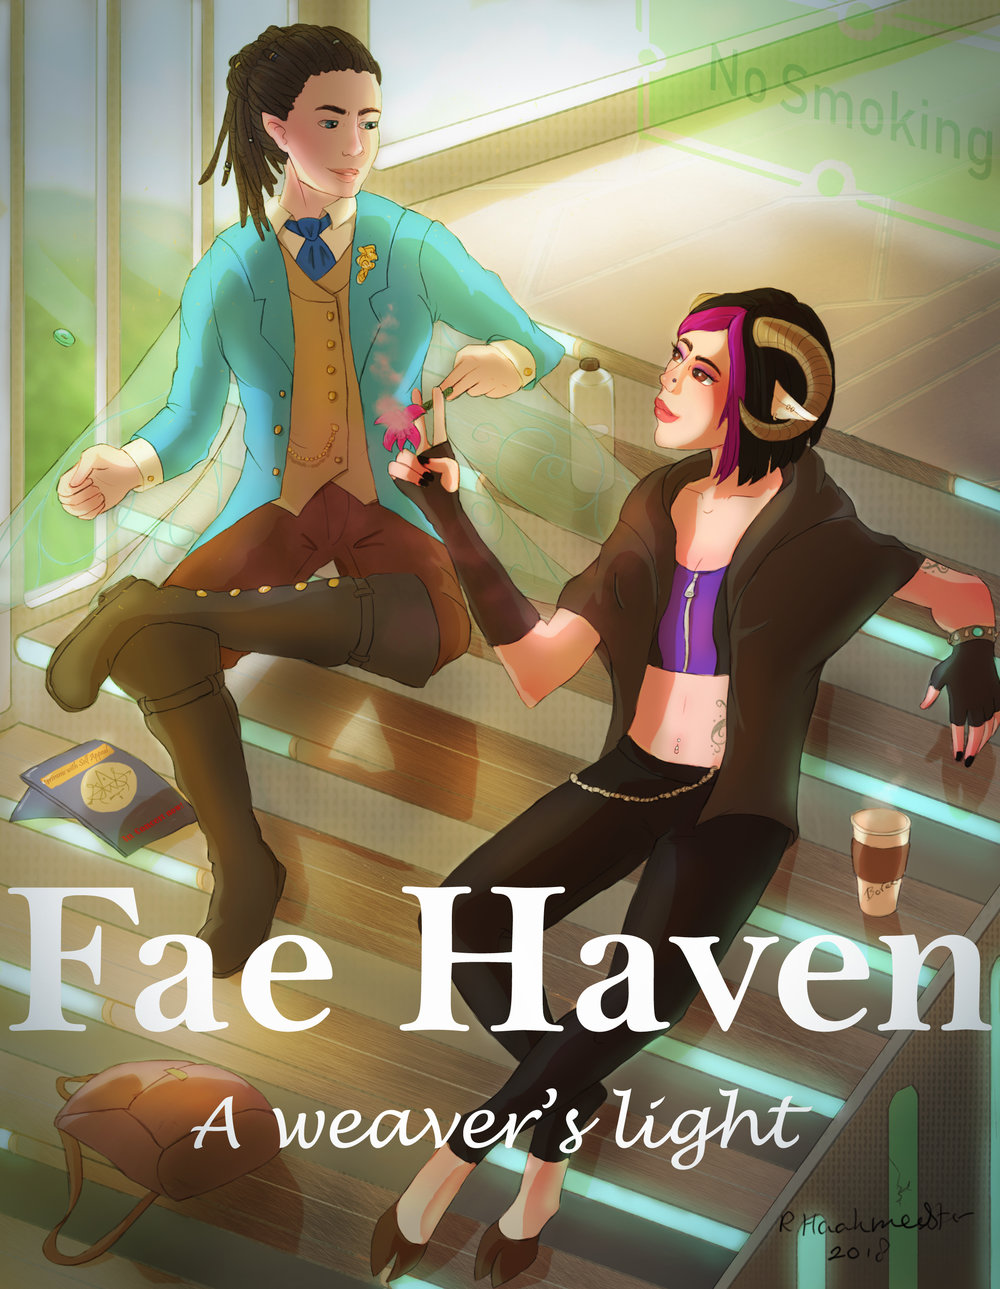 Fae  haven poster.jpg